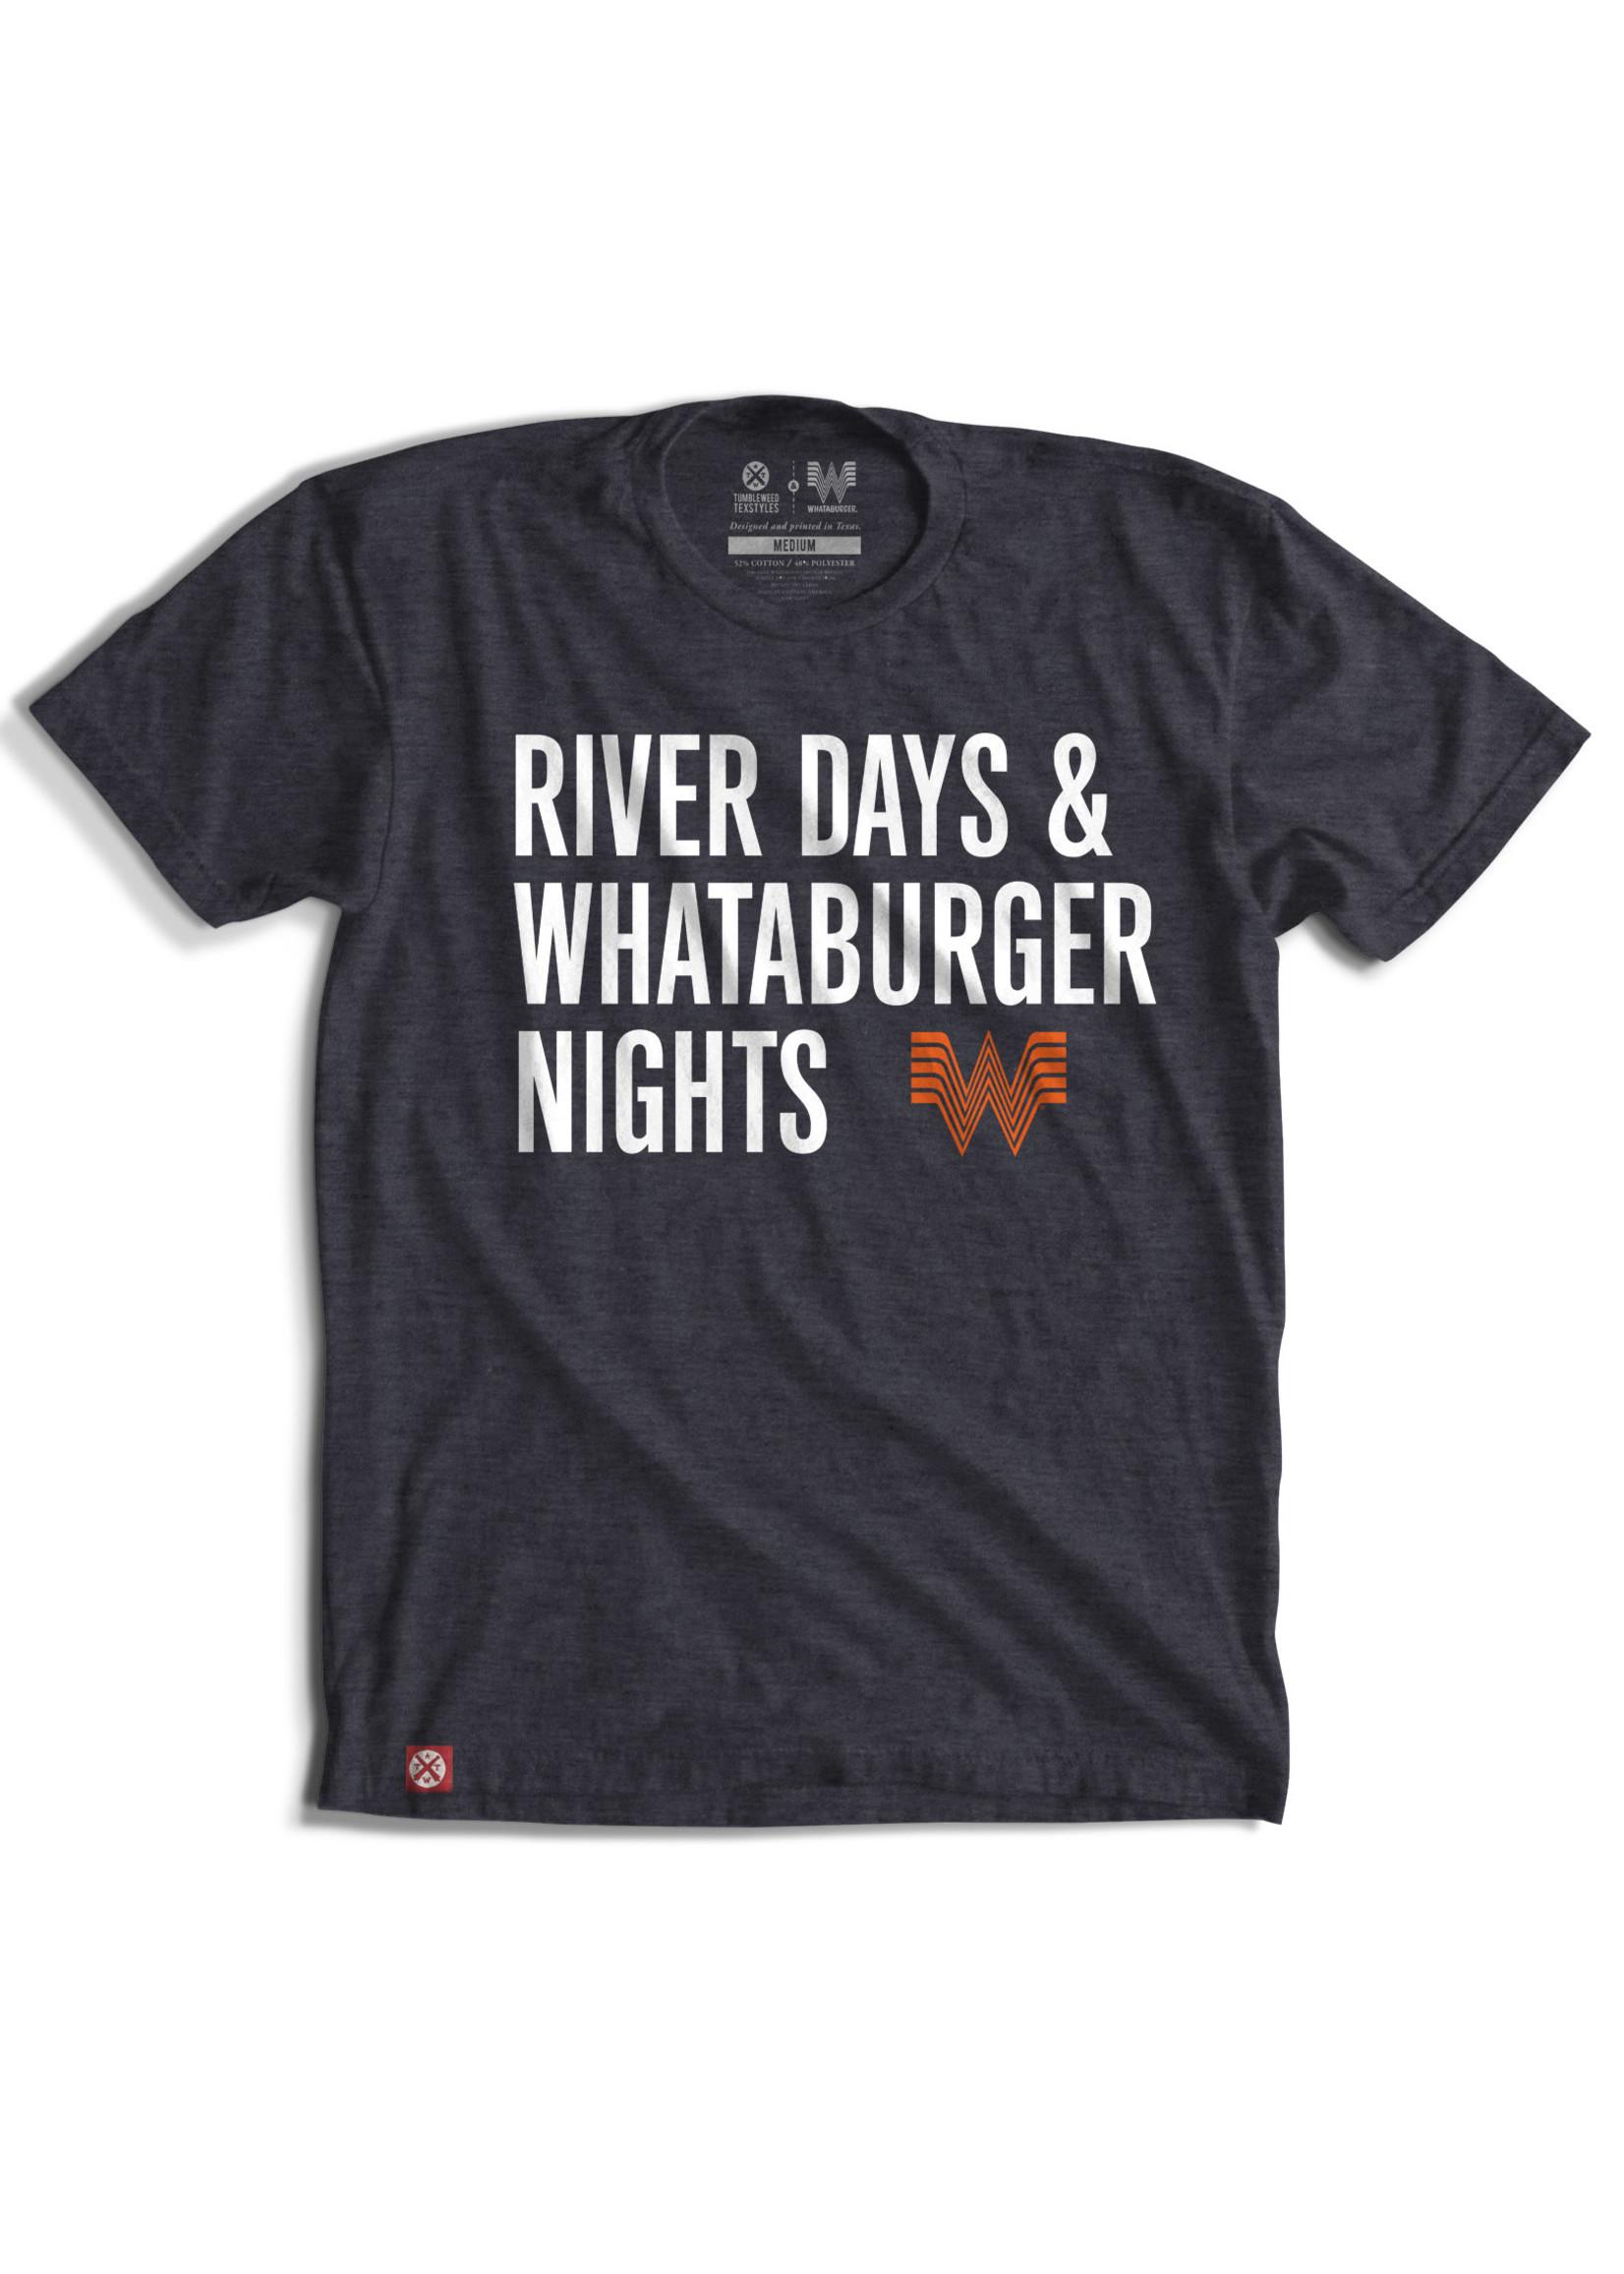 Tumbleweed Texstyles River Days Whataburger Nights